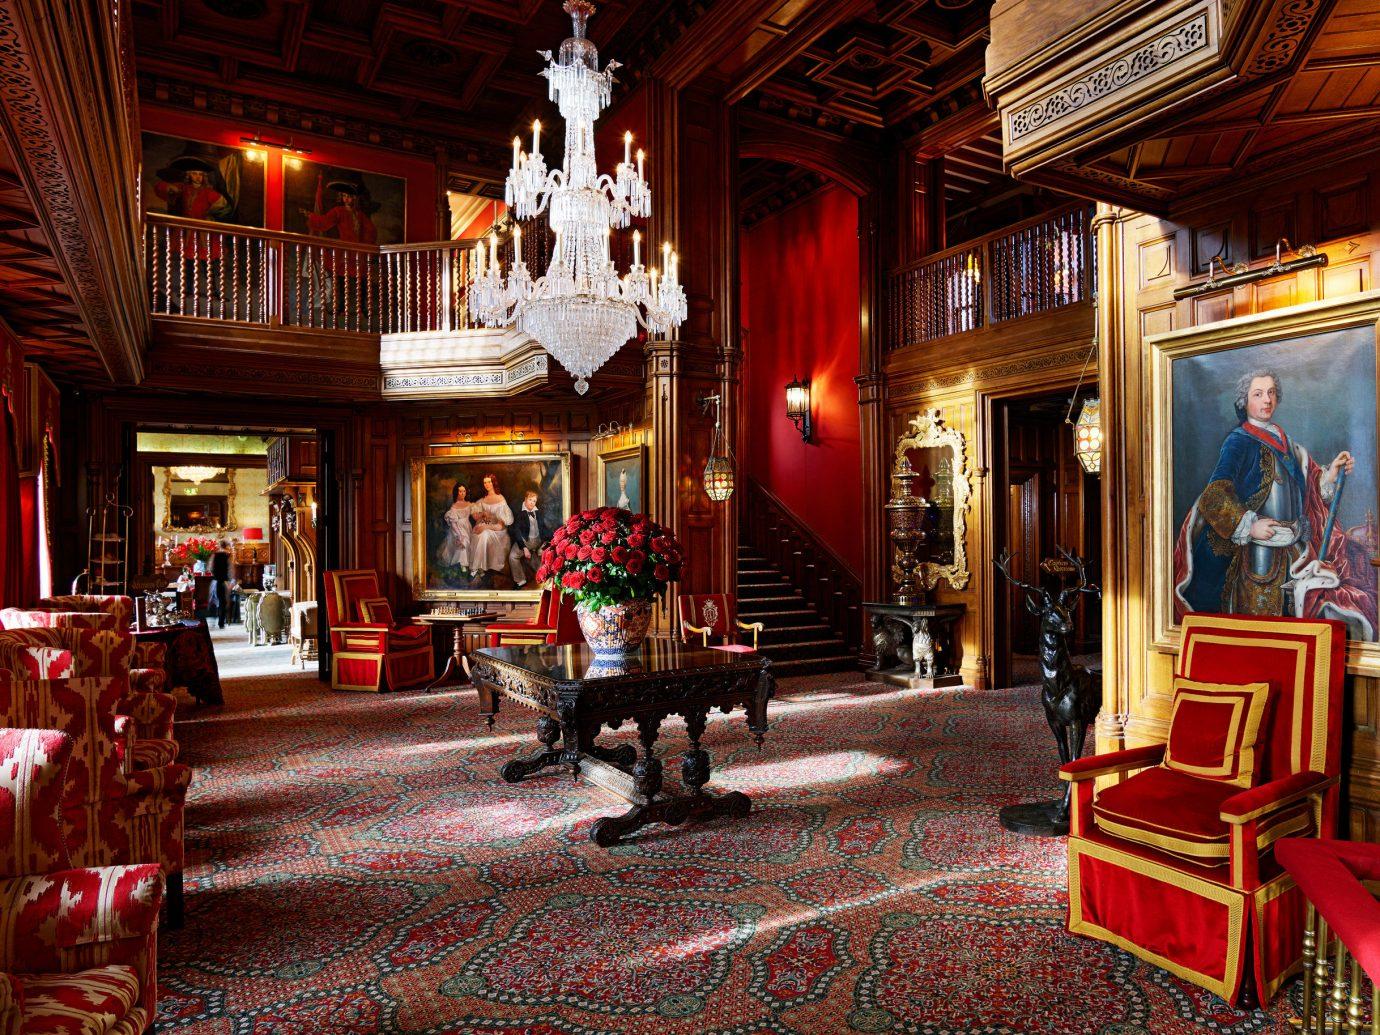 Hotels indoor building restaurant interior design palace